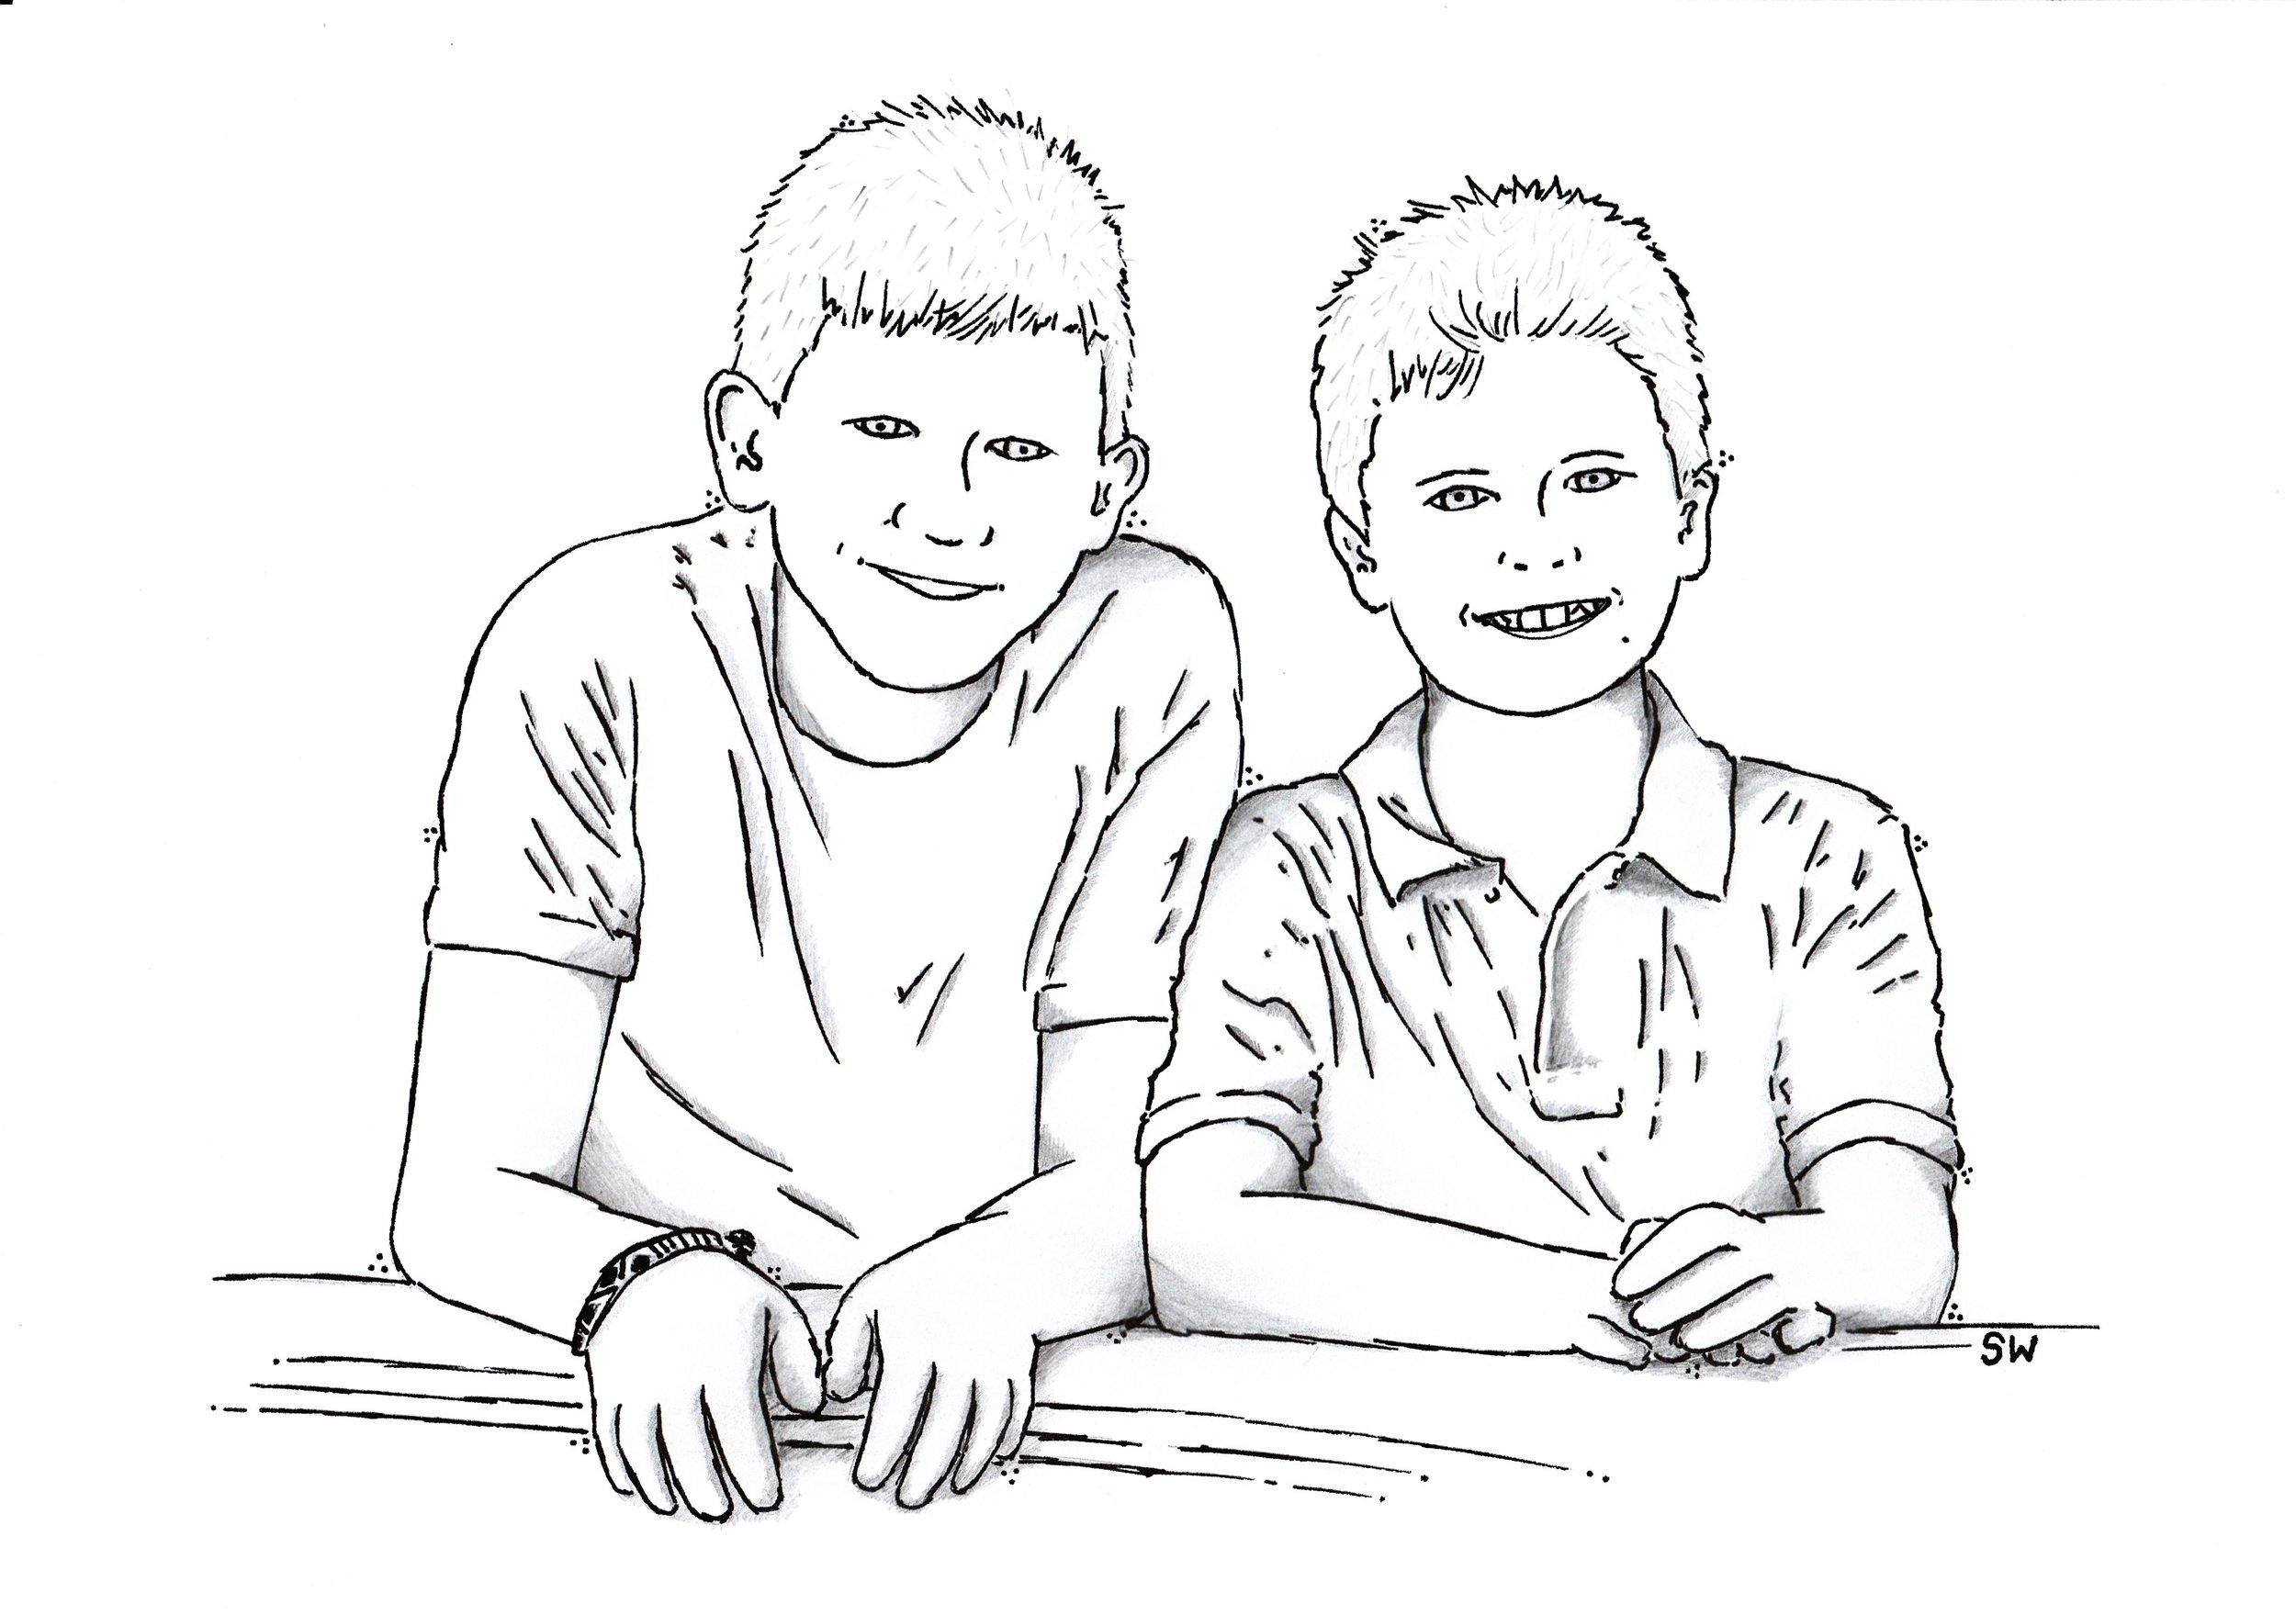 'Portrait' cartoon by Sid Wright sidwright.co.uk